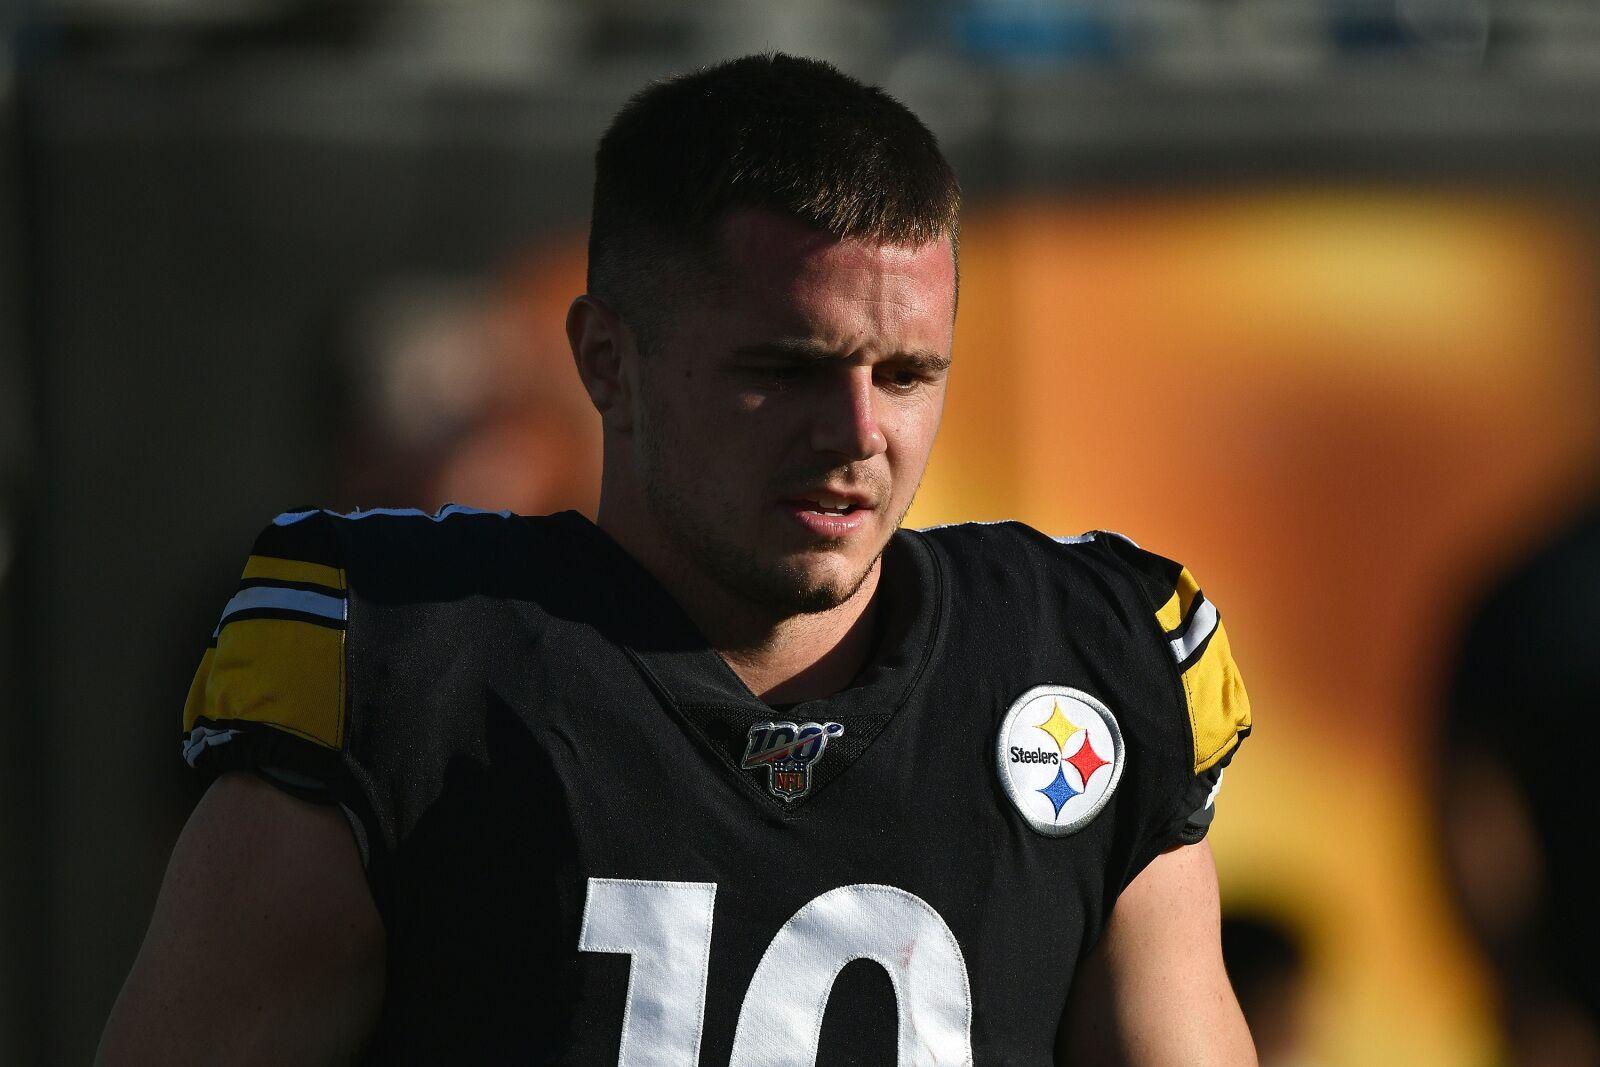 UNC Football Alumni: Ryan Switzer is emergency QB for Steelers